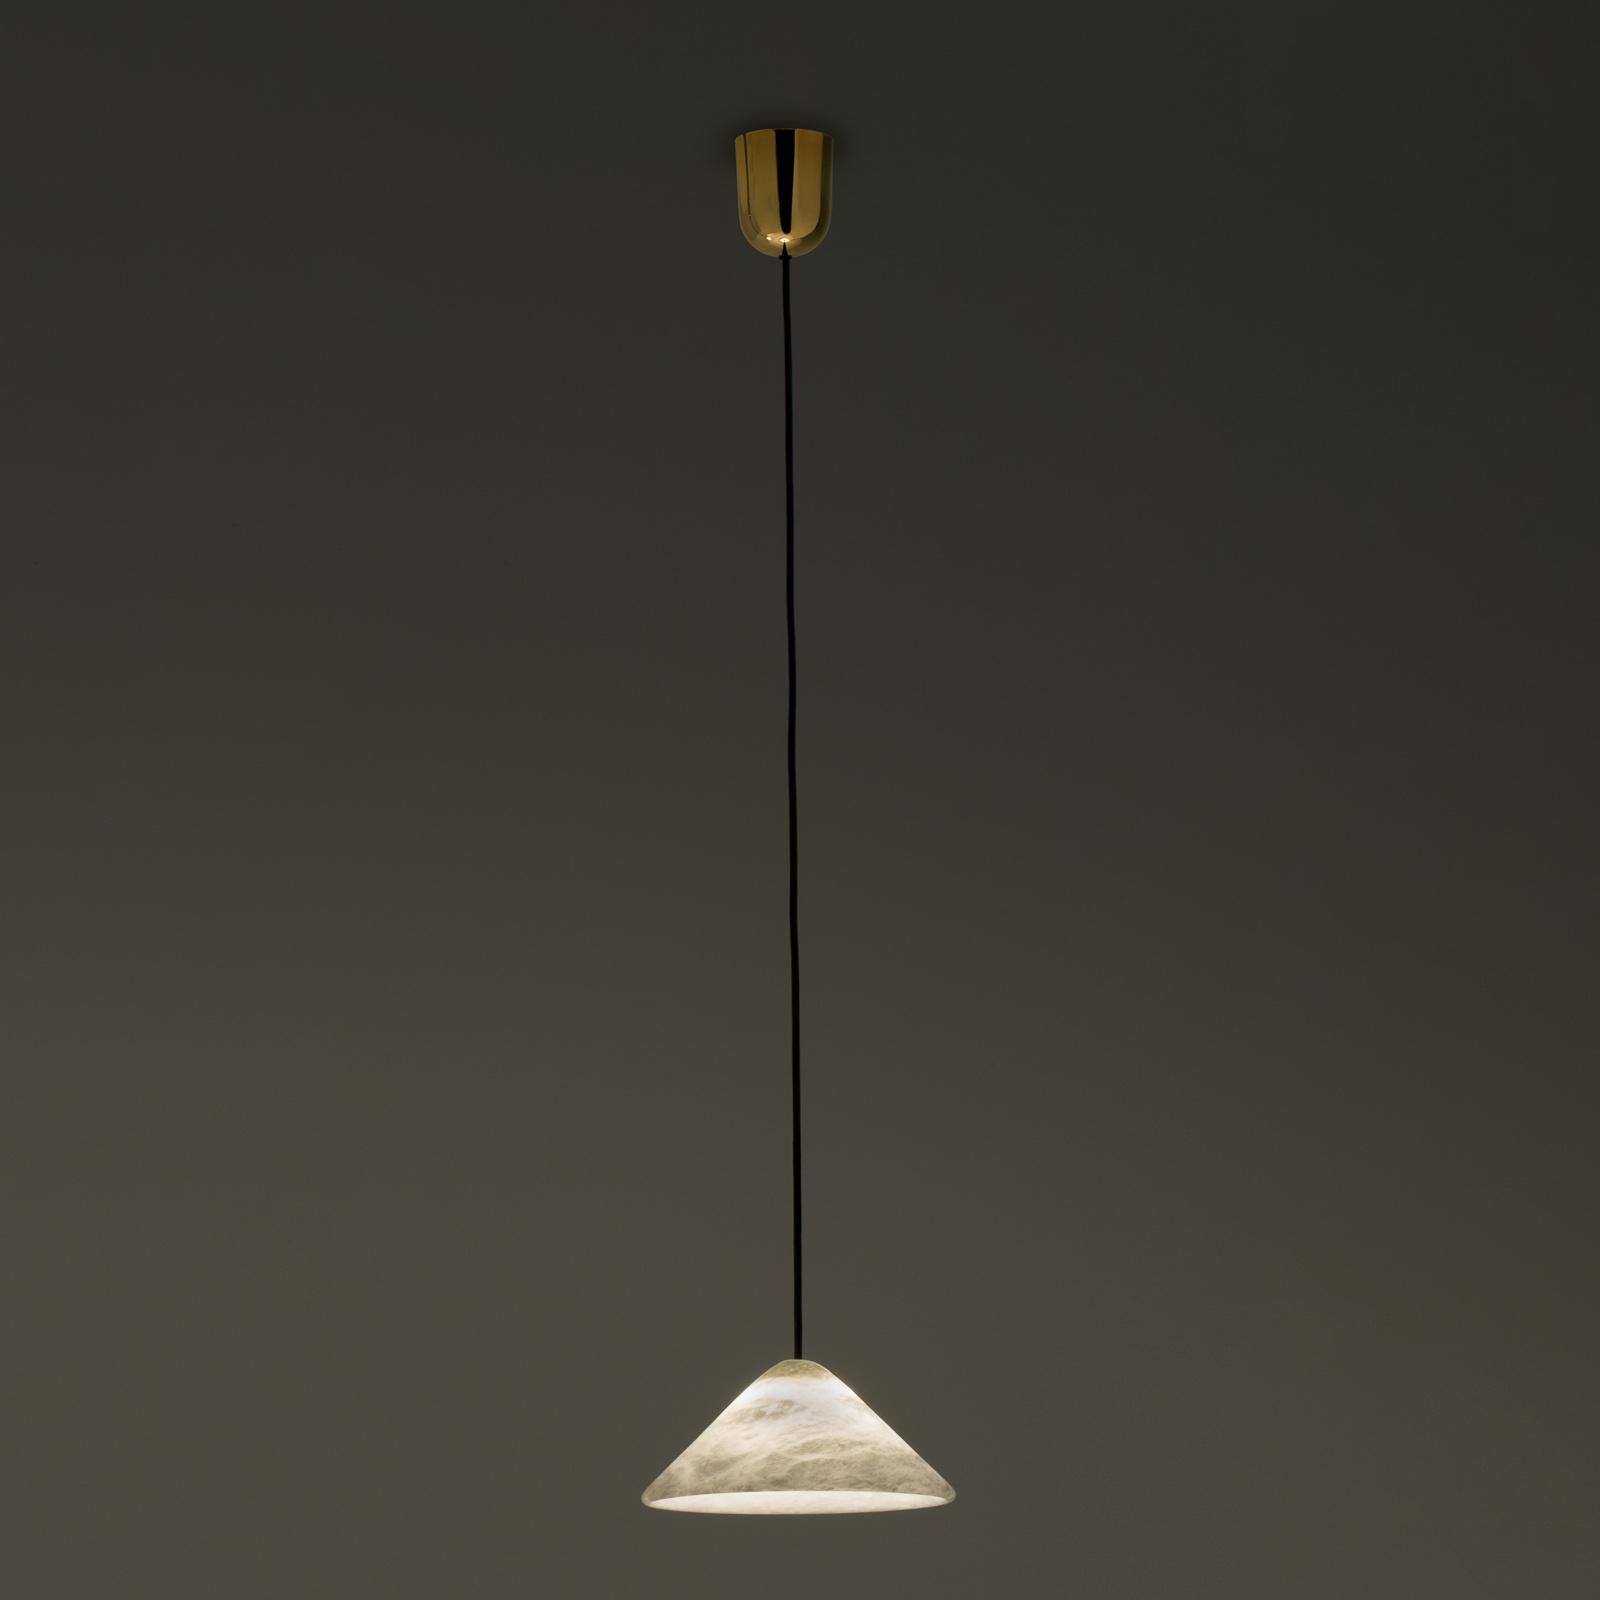 Lampa wisząca LED Fuji alabastrowa Ø 21 cm